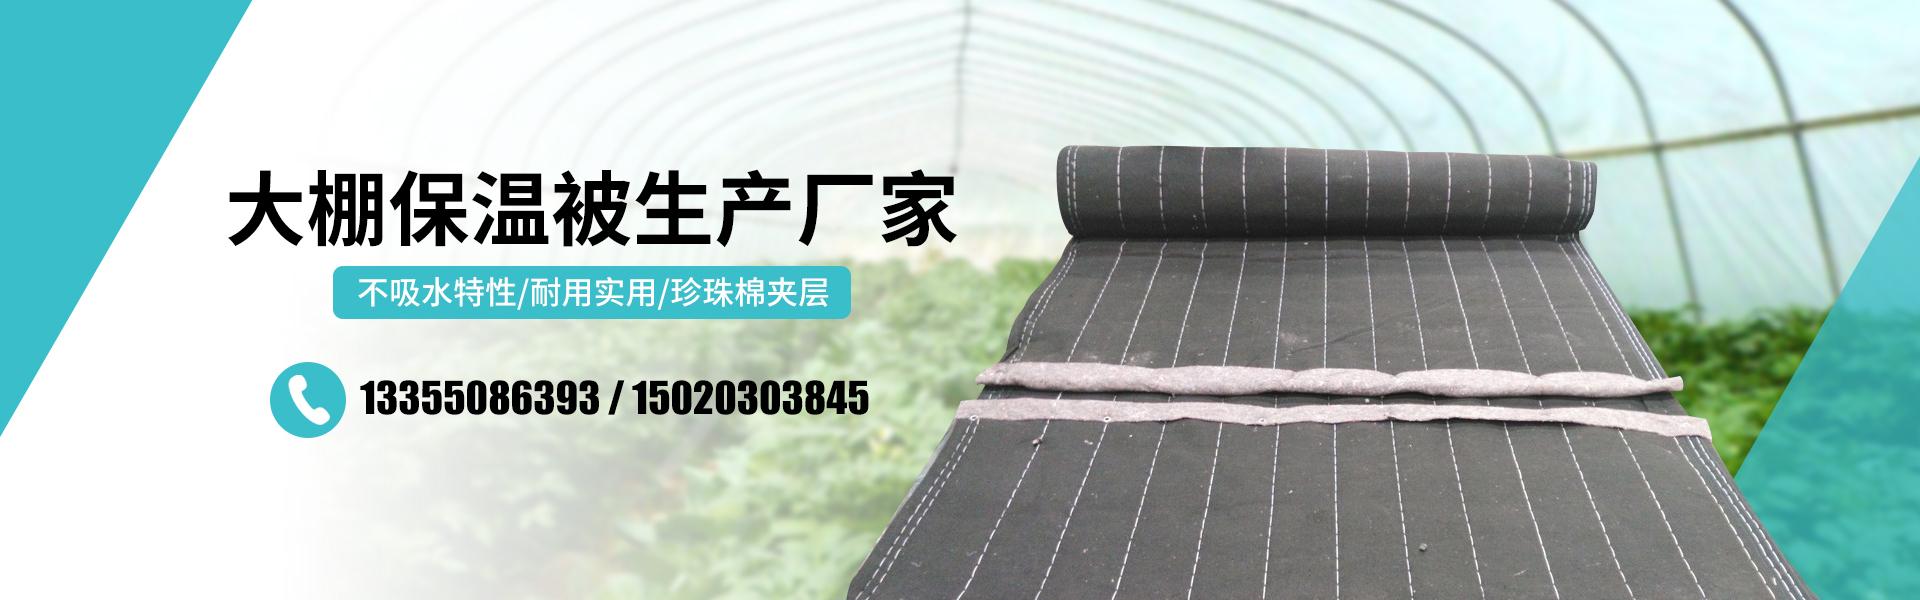 EPE爬行垫,EPE环保地垫,爬行垫厂家,大棚保温被